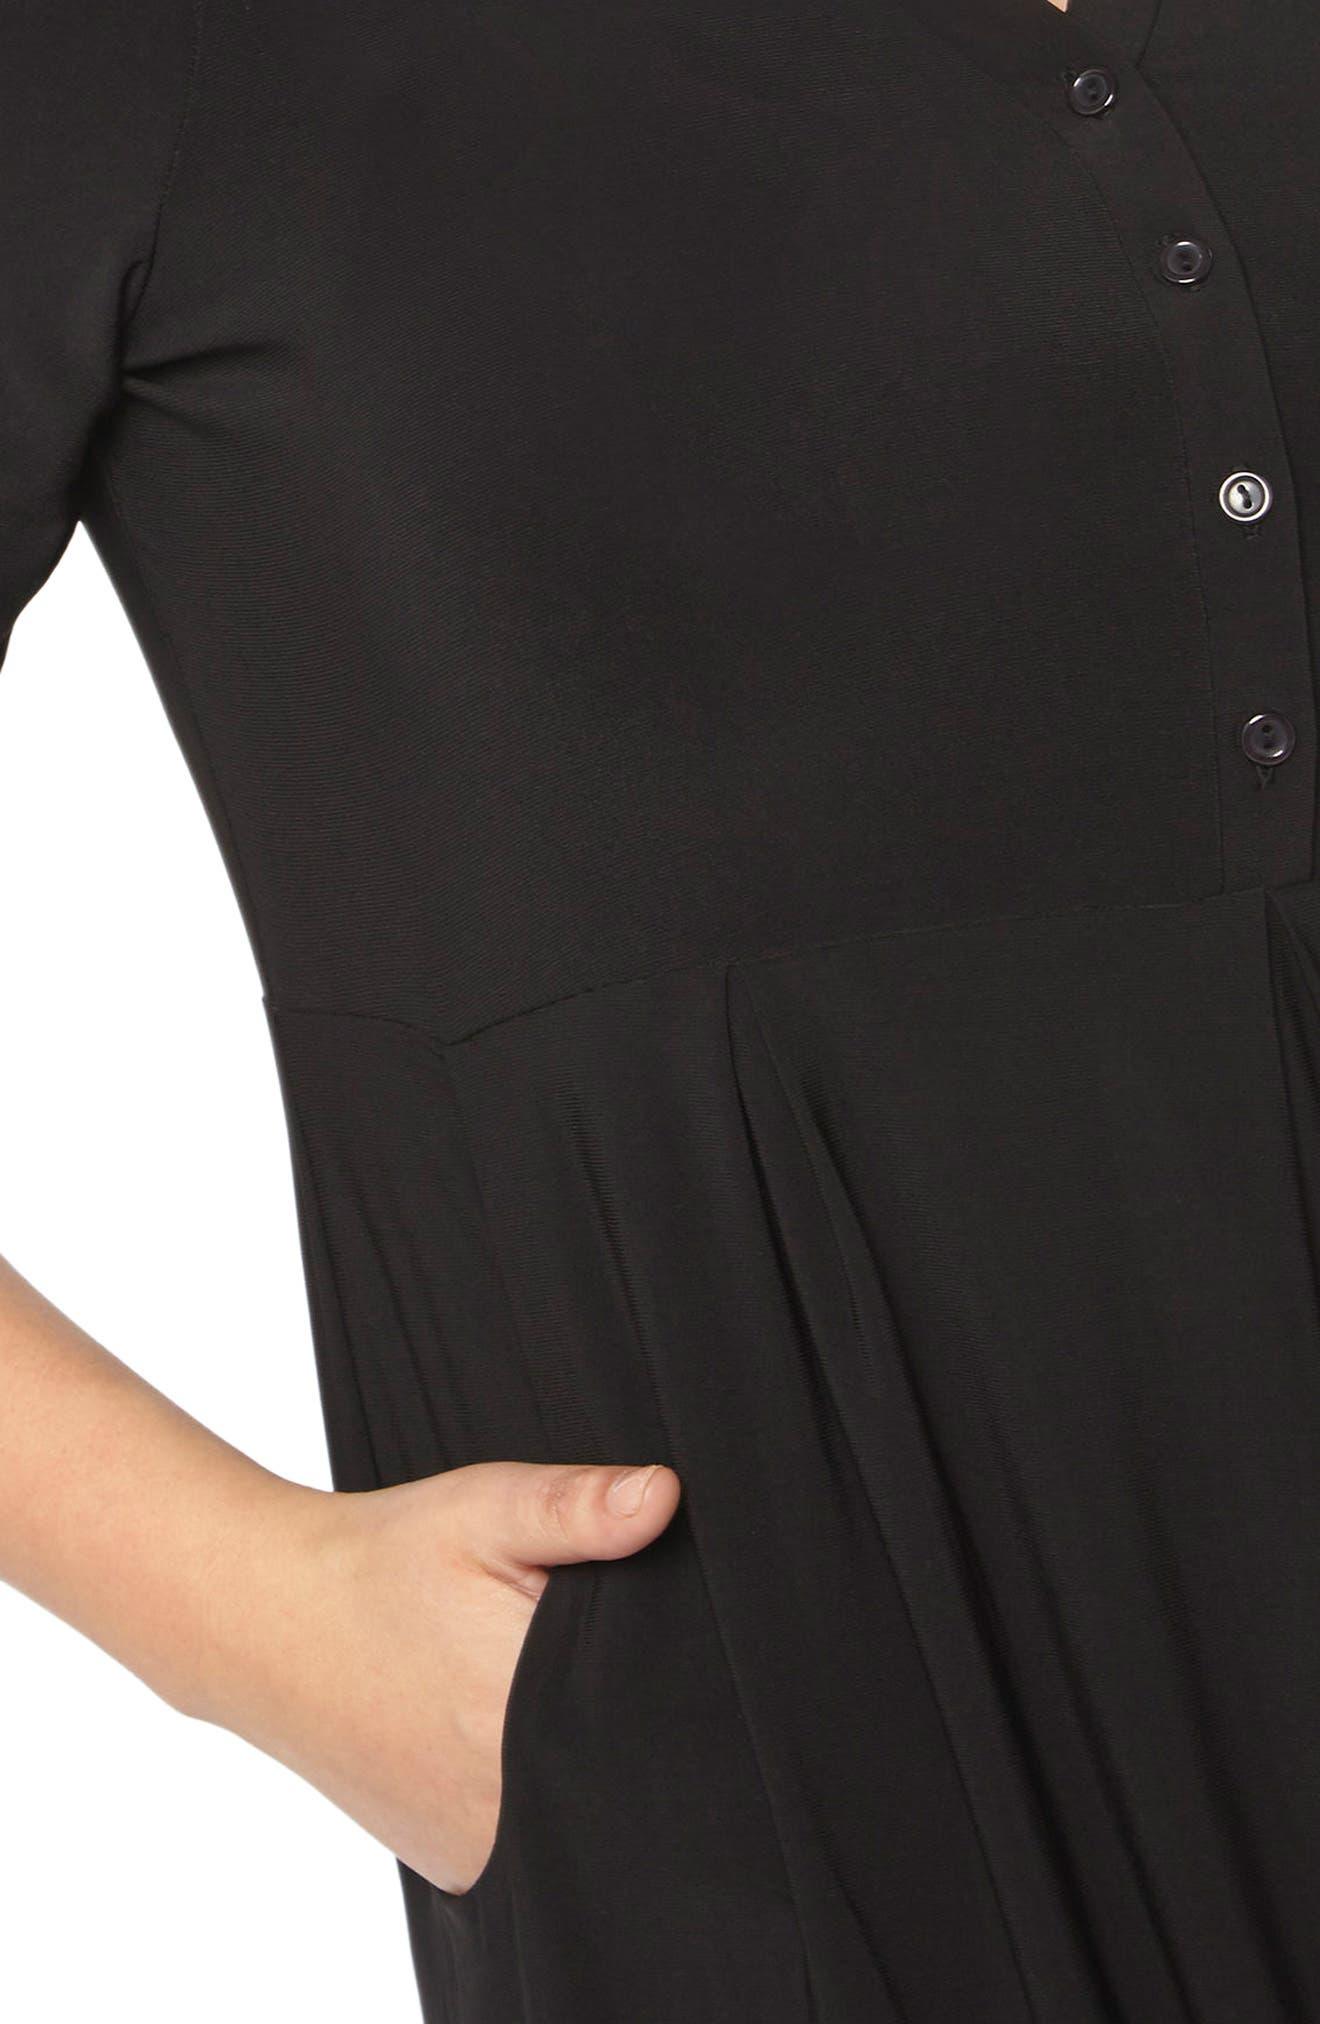 Pleat Jersey Dress,                             Alternate thumbnail 4, color,                             Black